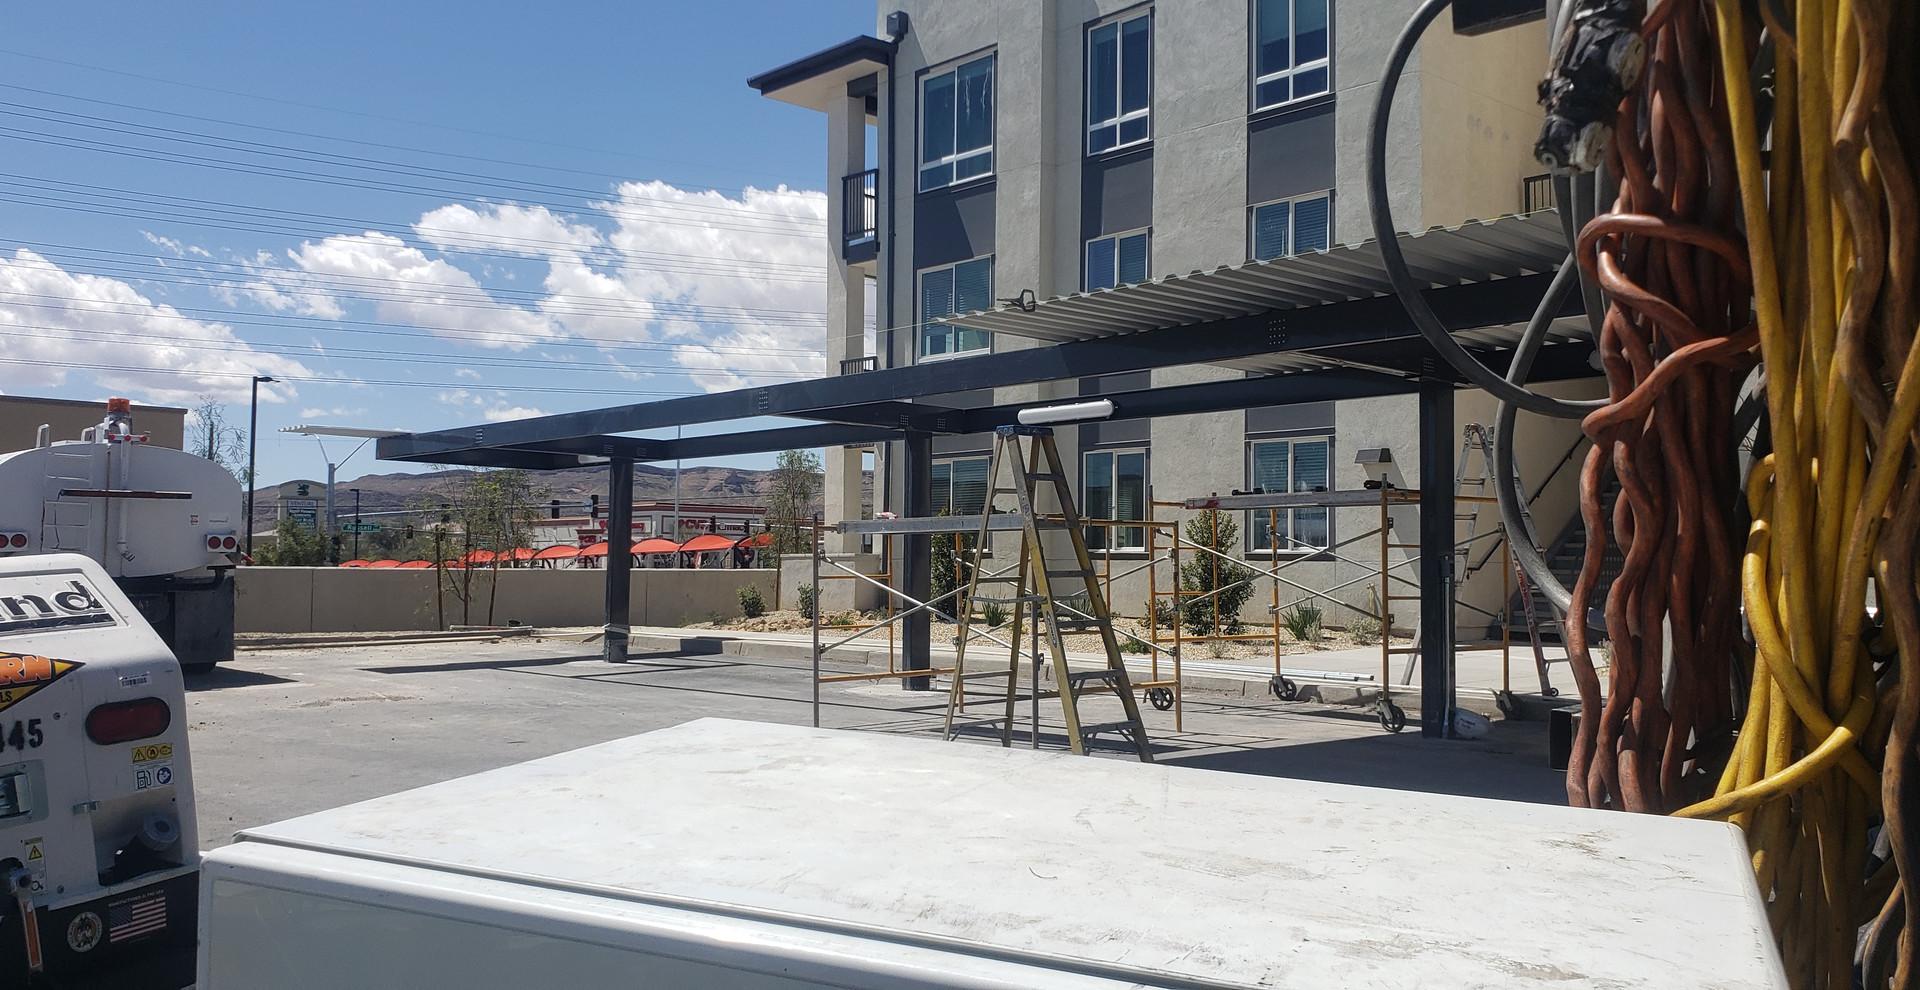 Commercial Carports by Las Vegas - Intrepid Metal Works Inc.